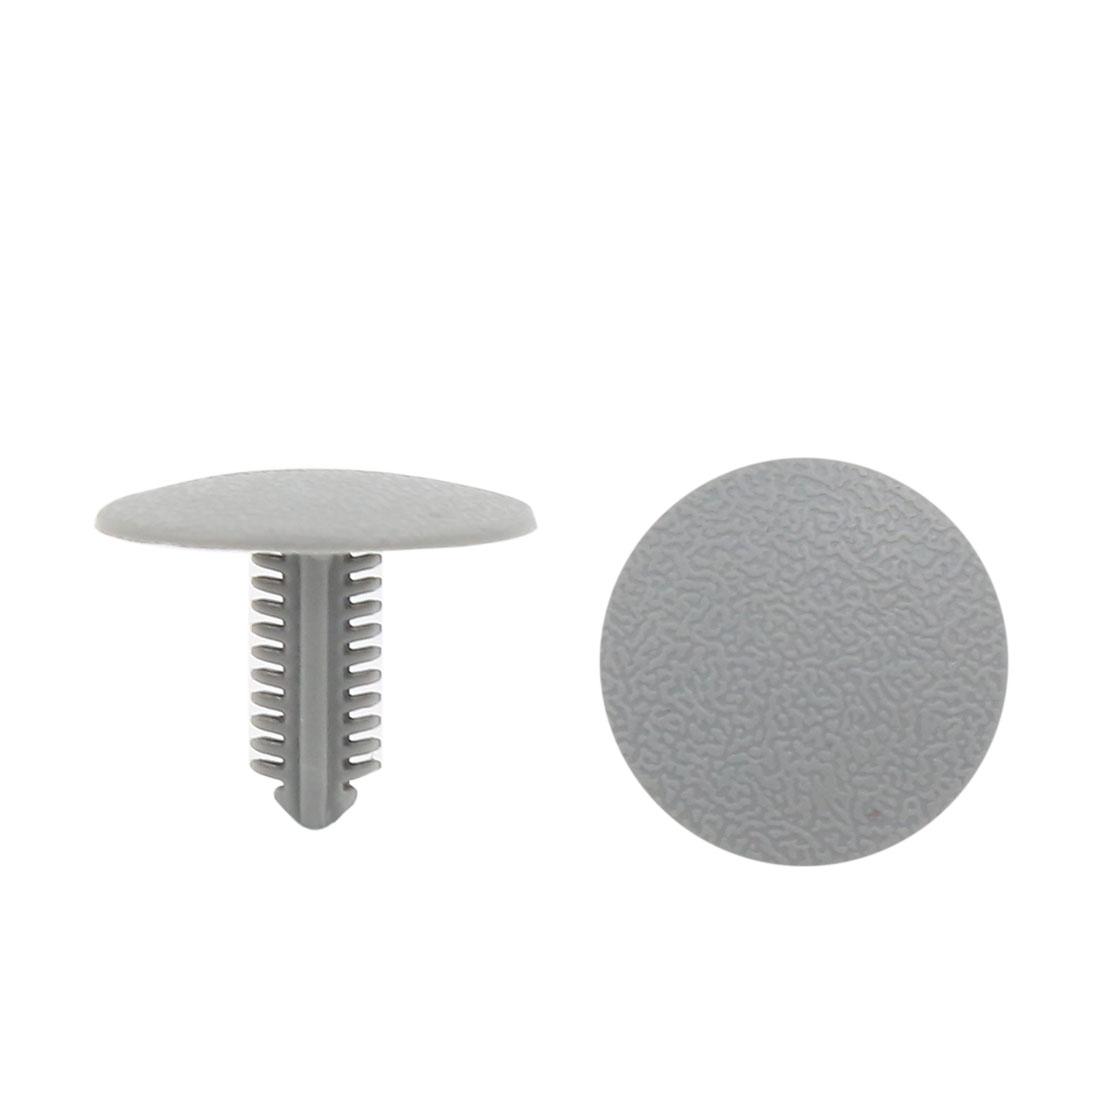 100Pcs Plastic 7mm x 5.5mm Hole Dia Screw Fastener Rivet Retainers Hood Clip